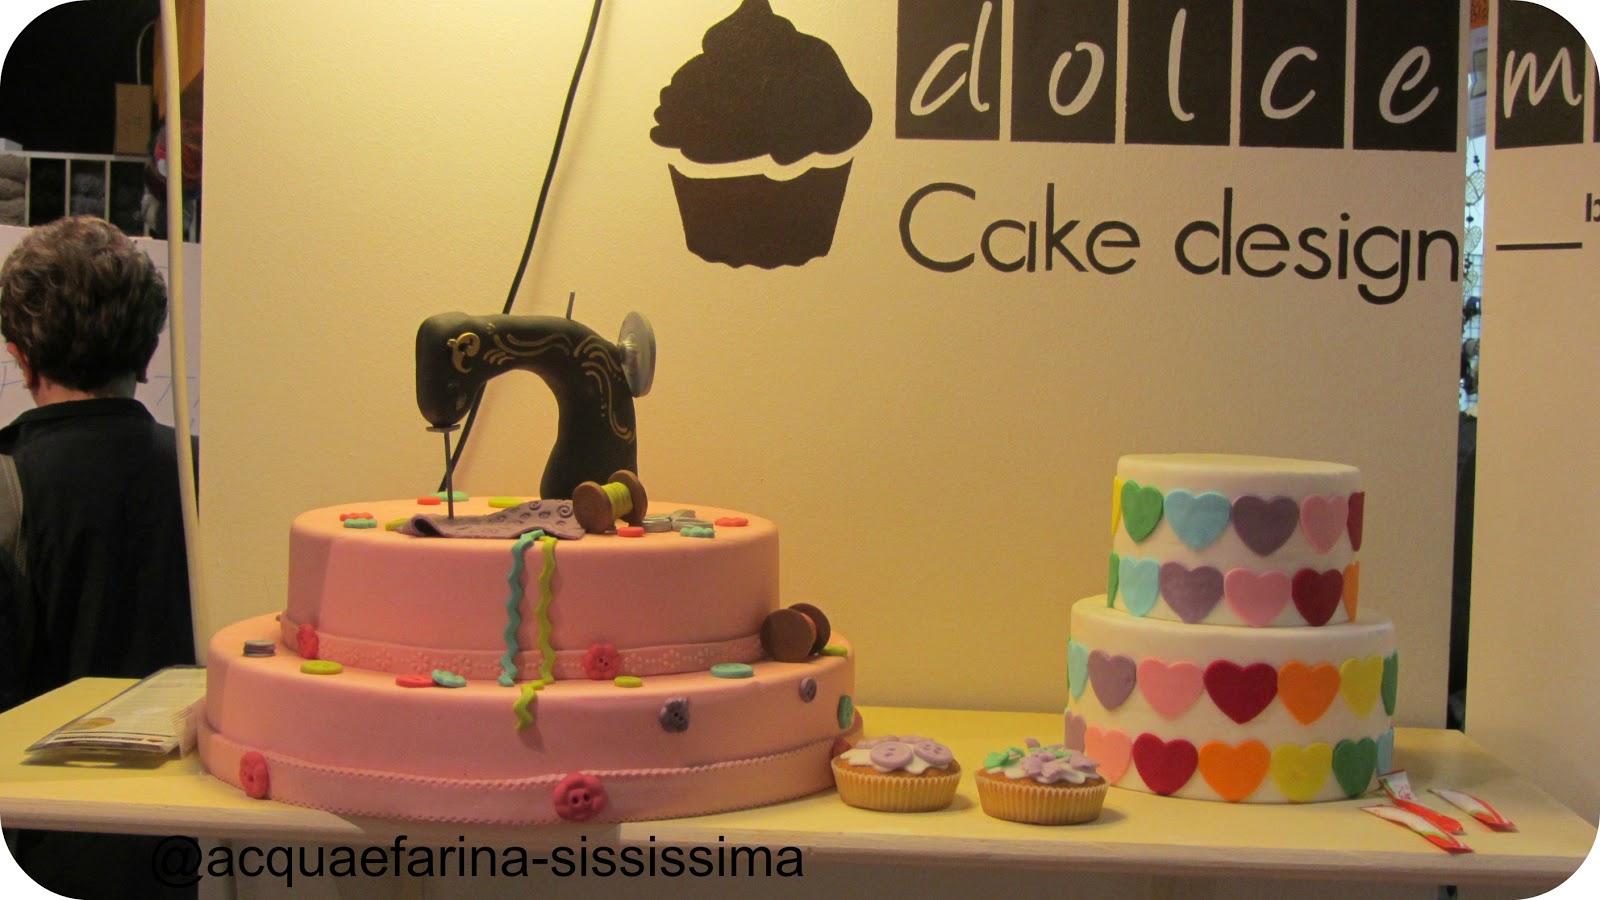 Scuola Di Cake Design A Roma : acqua e farina-sississima: Hobby Show